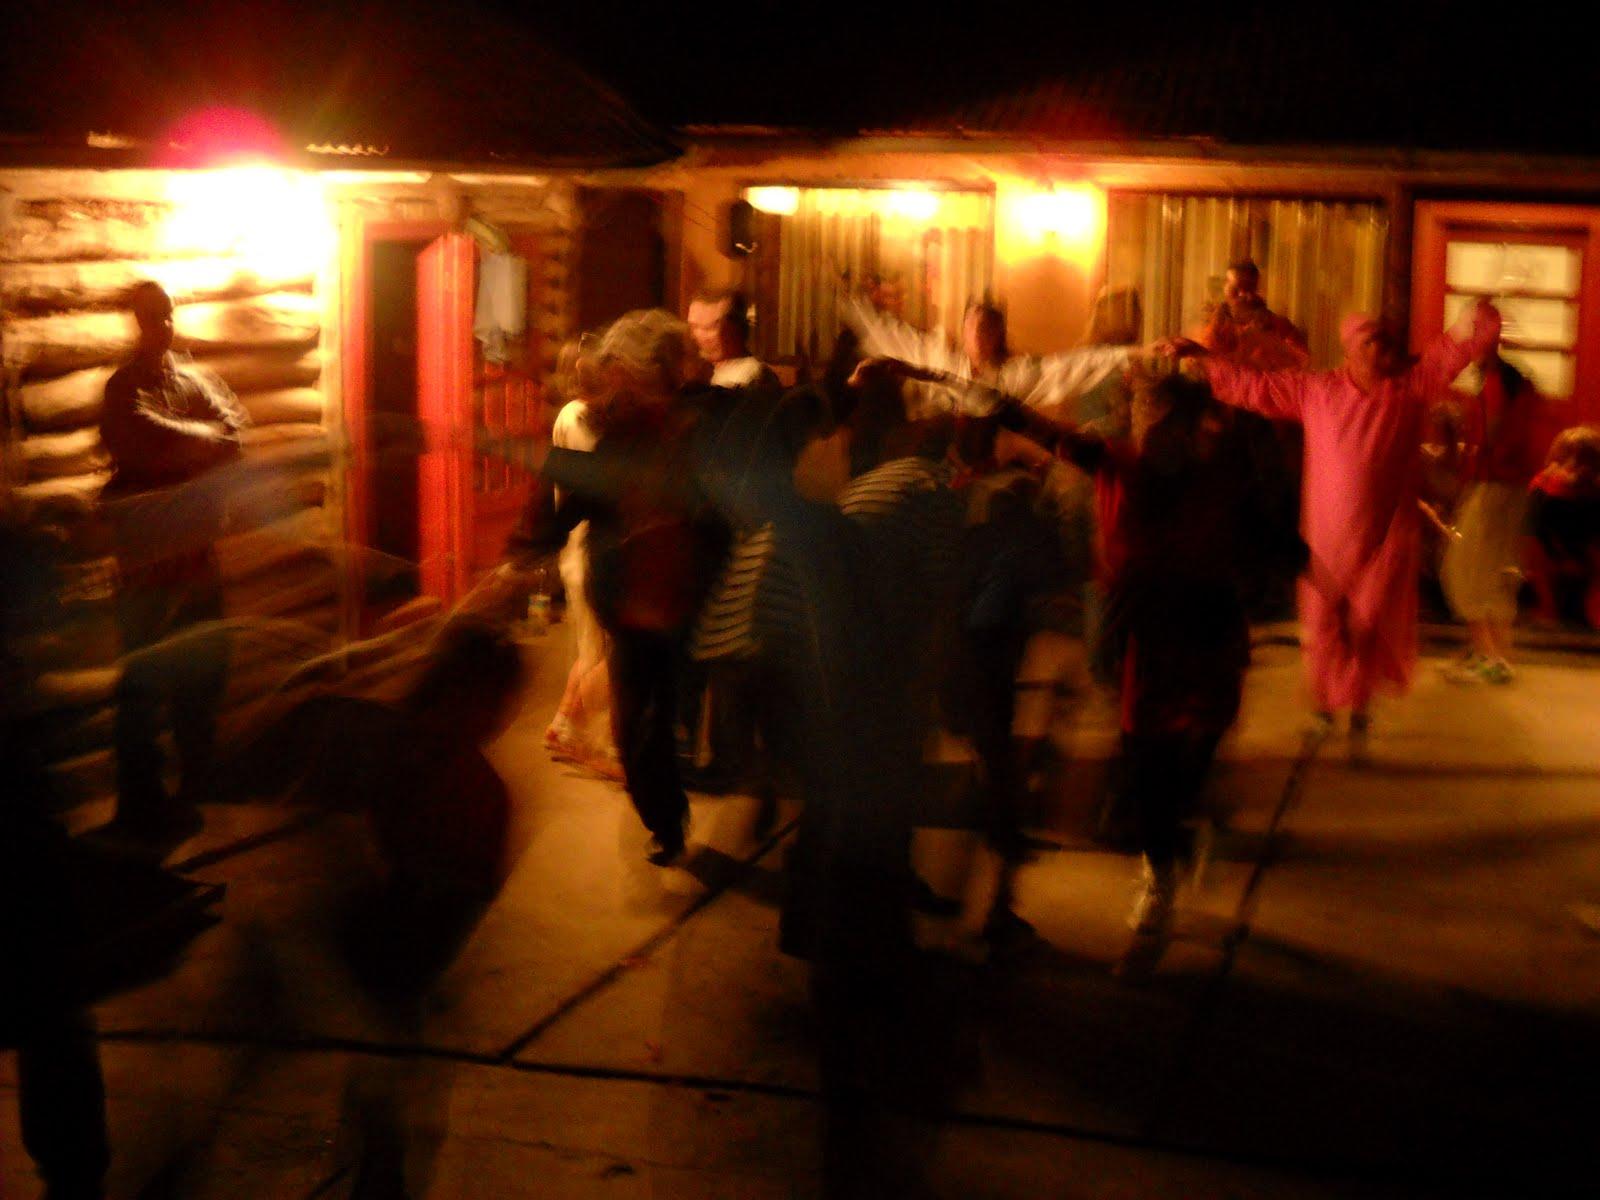 http://1.bp.blogspot.com/_ILnlQVHu15Q/S9bfBk1WDWI/AAAAAAAABPg/S4SBEoAGOhg/s1600/show+mare+la+cabana+Motesti.jpg